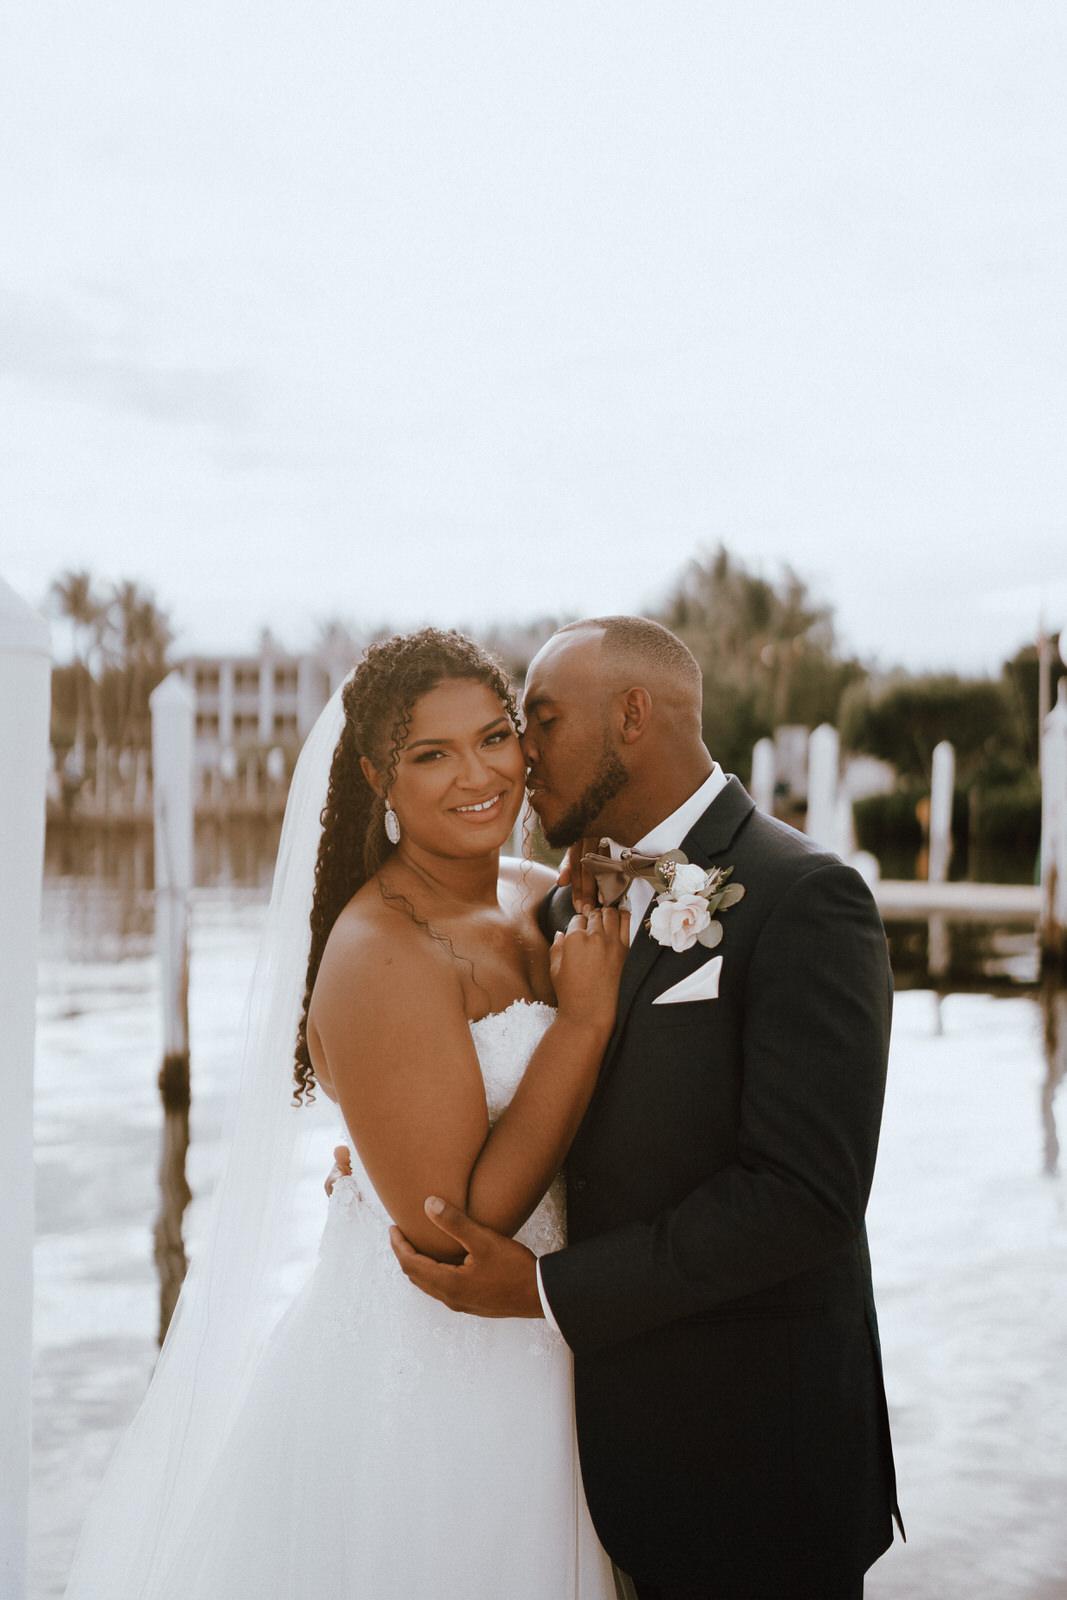 South Seas Island Resort Elopement- Alyana and Shawn- Michelle Gonzalez Photography-382.JPG